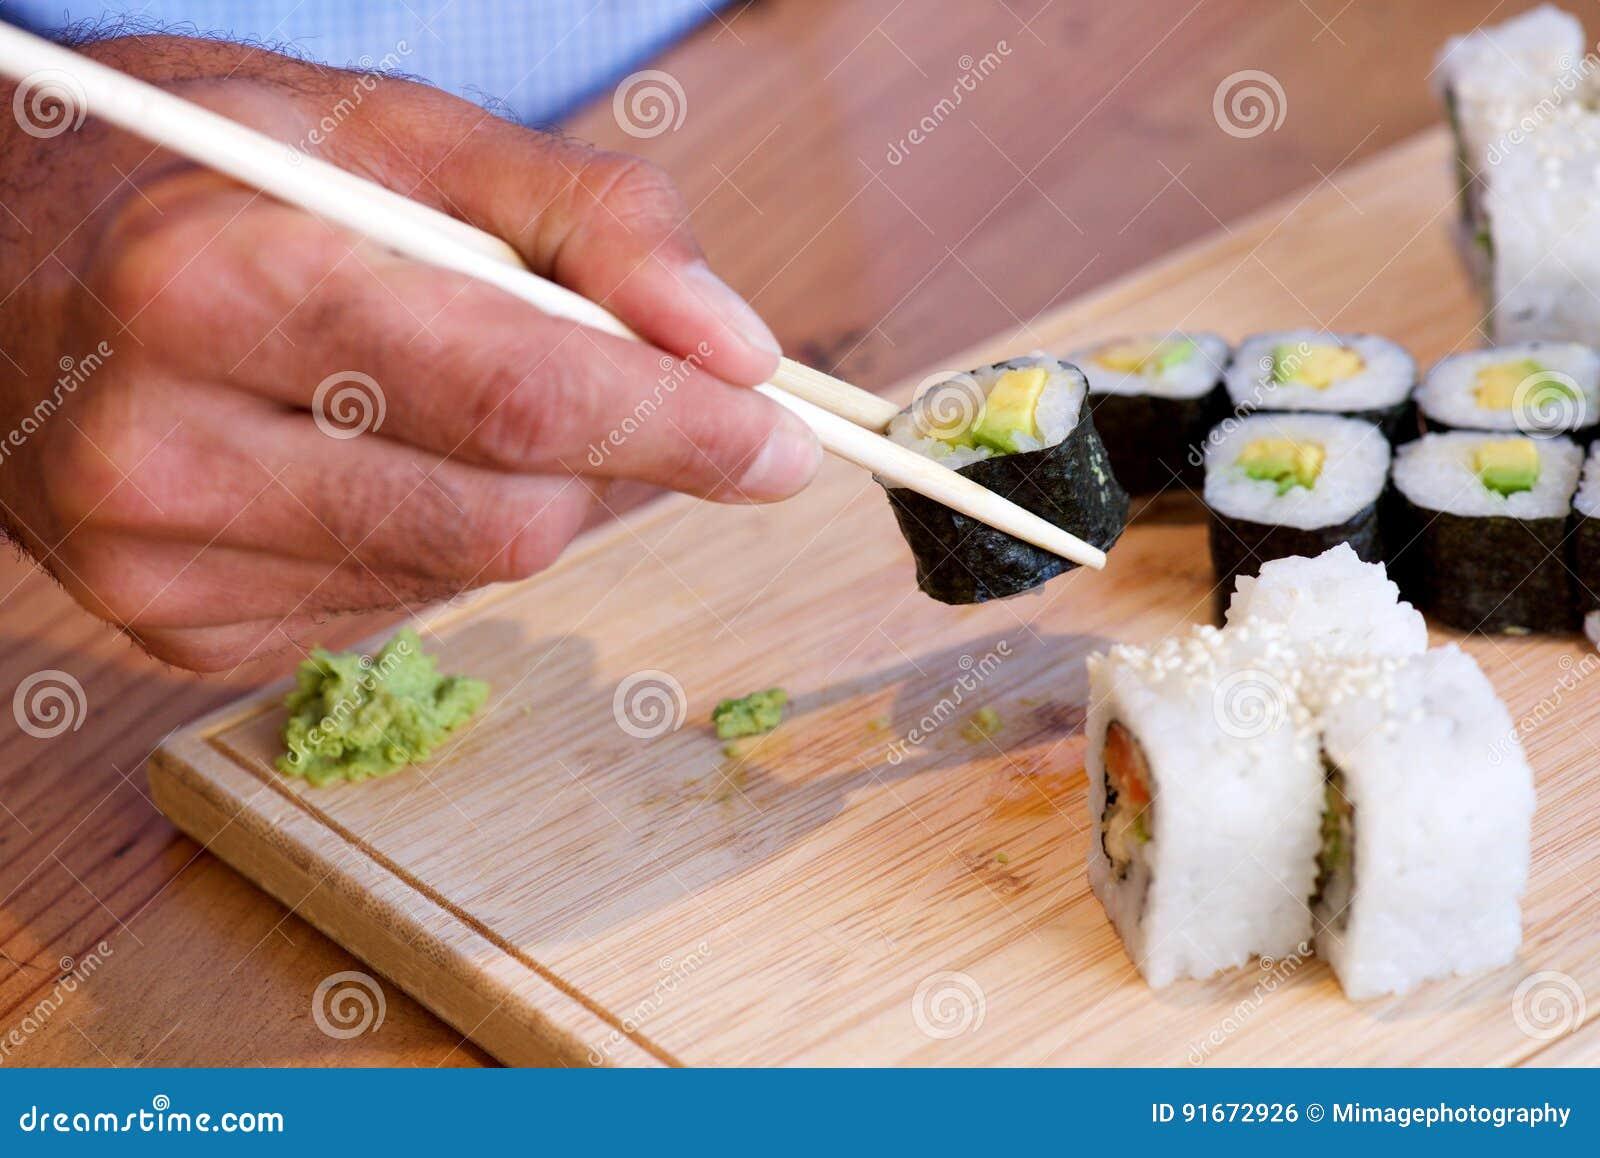 male hands holding chopsticks and eating sushi stock photo. Black Bedroom Furniture Sets. Home Design Ideas